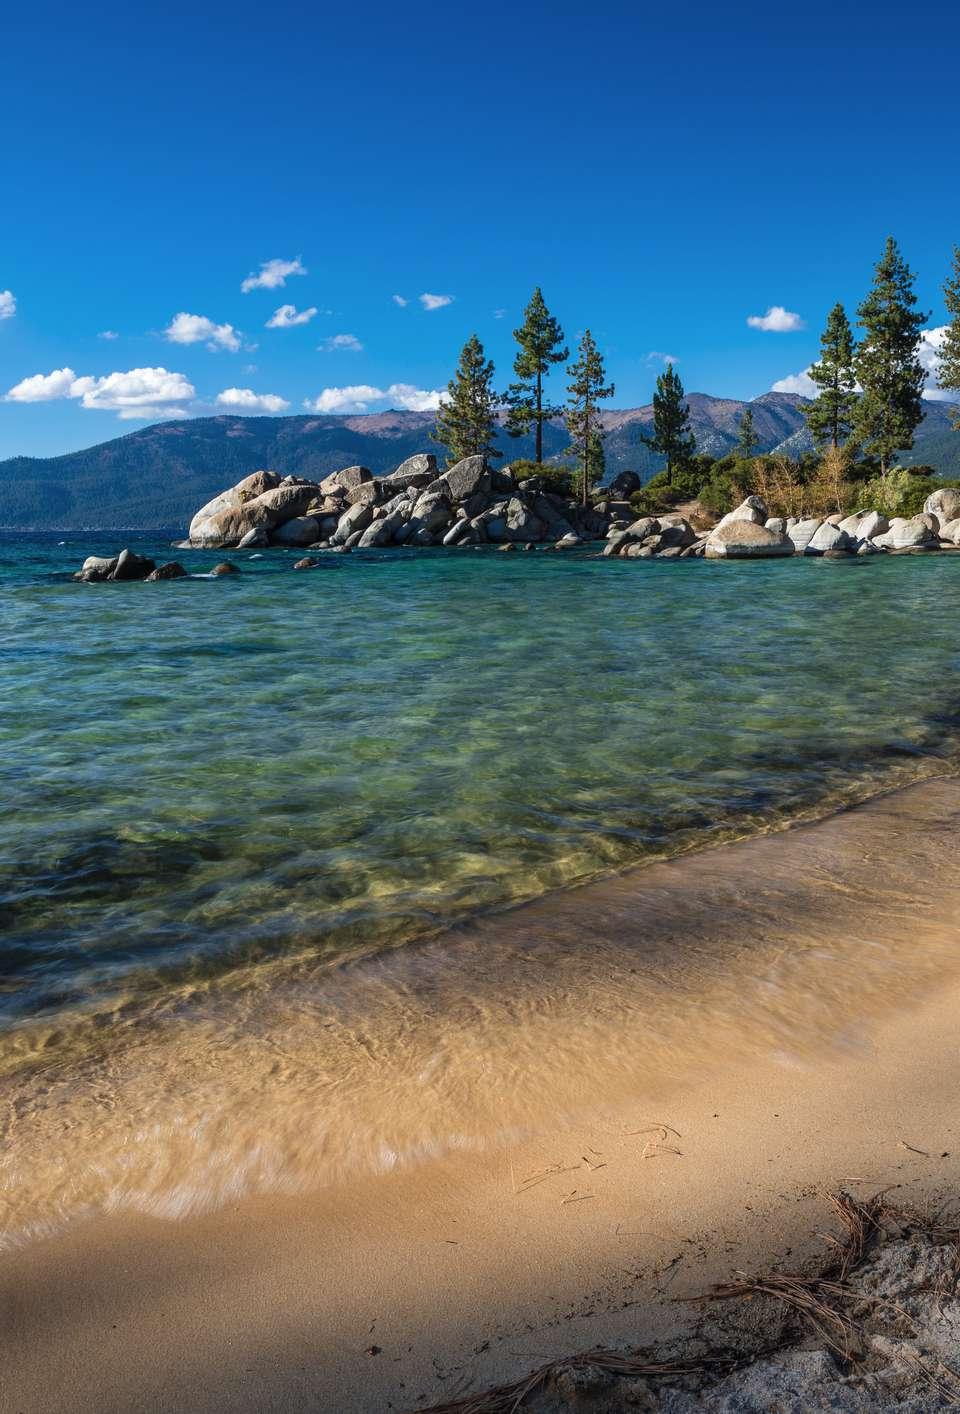 Scenic landscape of Sand Harbor State Park, Lake Tahoe, Nevada, USA